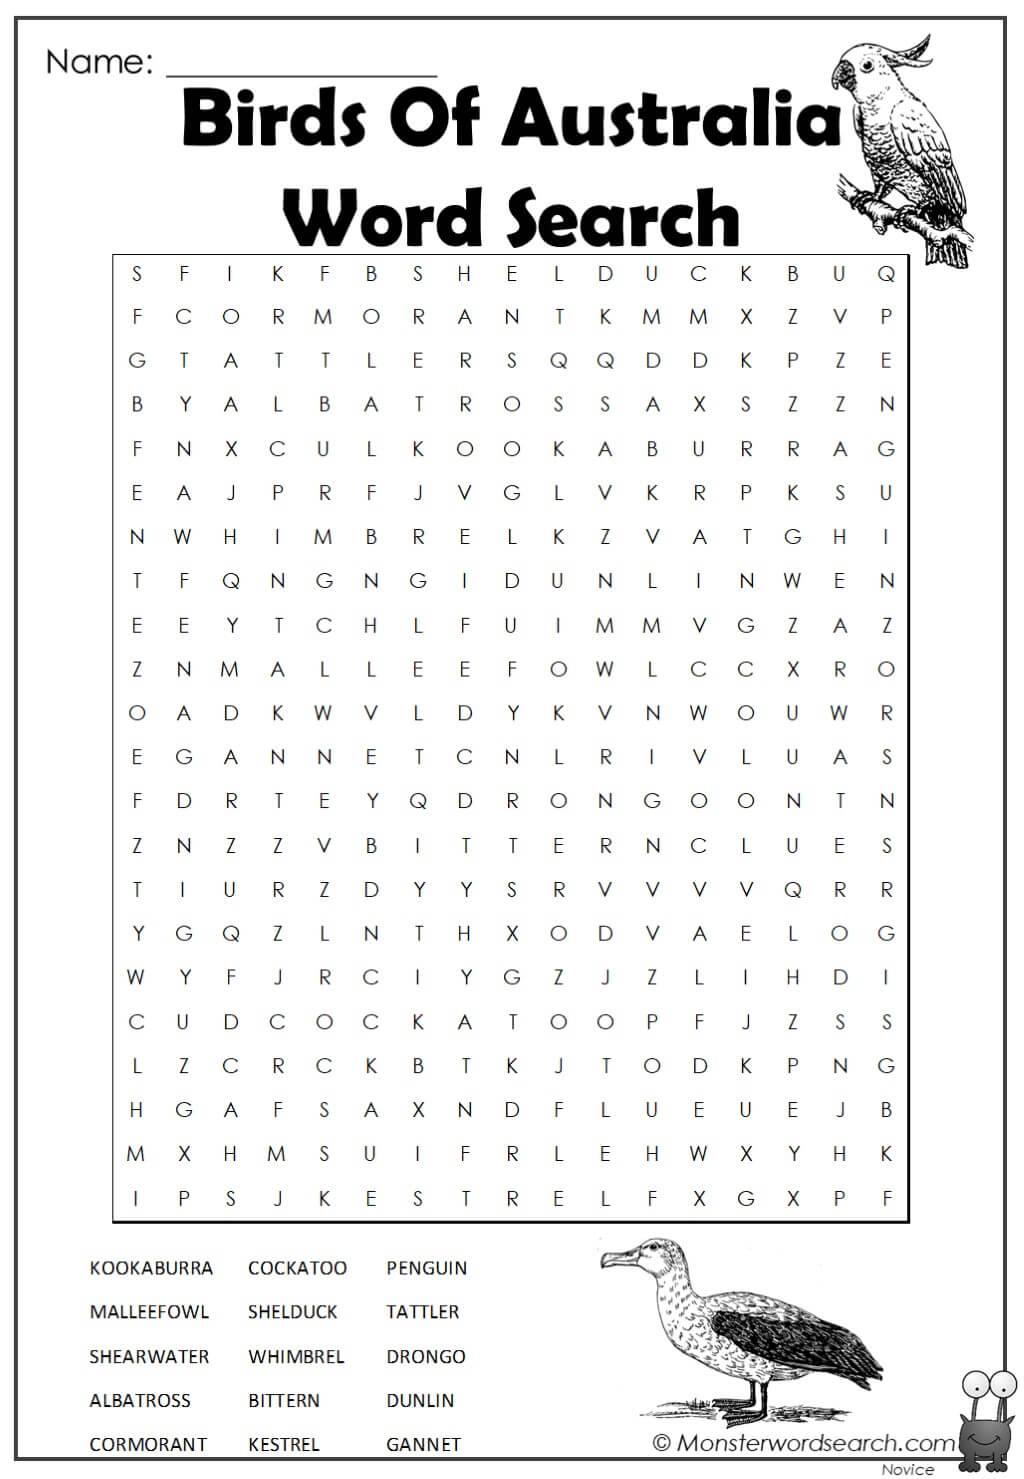 Birds Of Australia Word Search 1